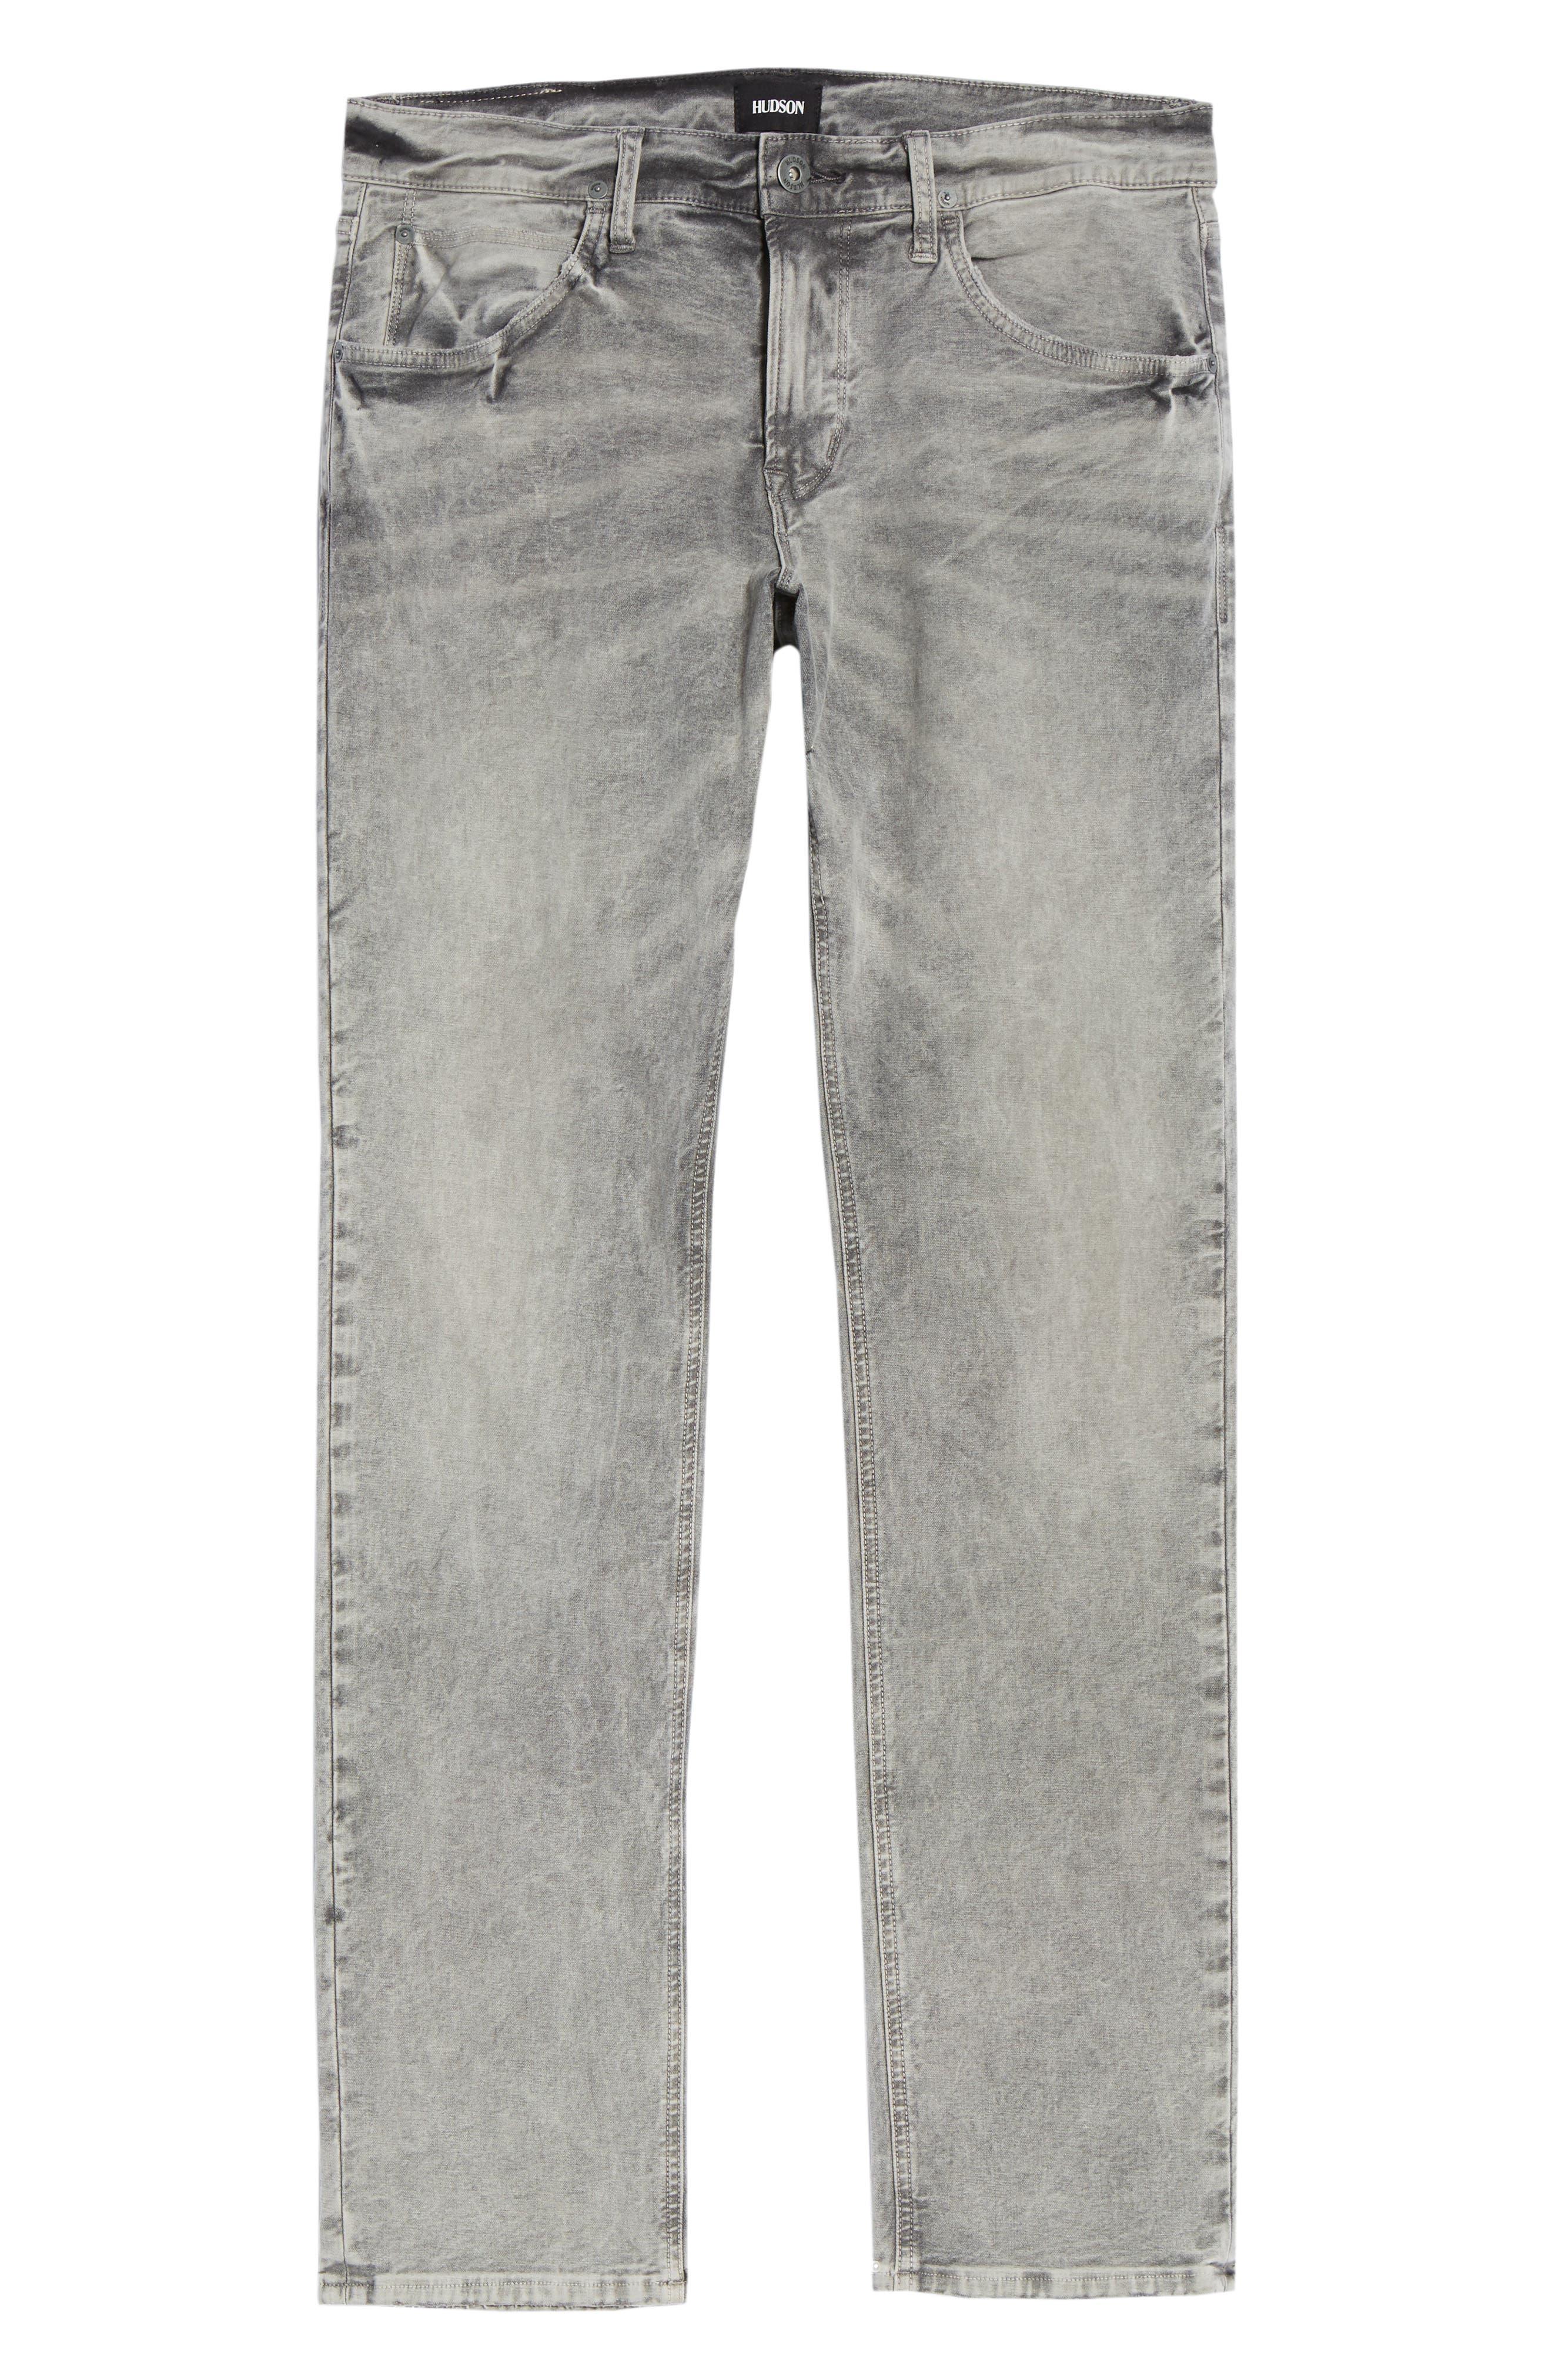 Blake Slim Fit Jeans,                             Alternate thumbnail 6, color,                             063